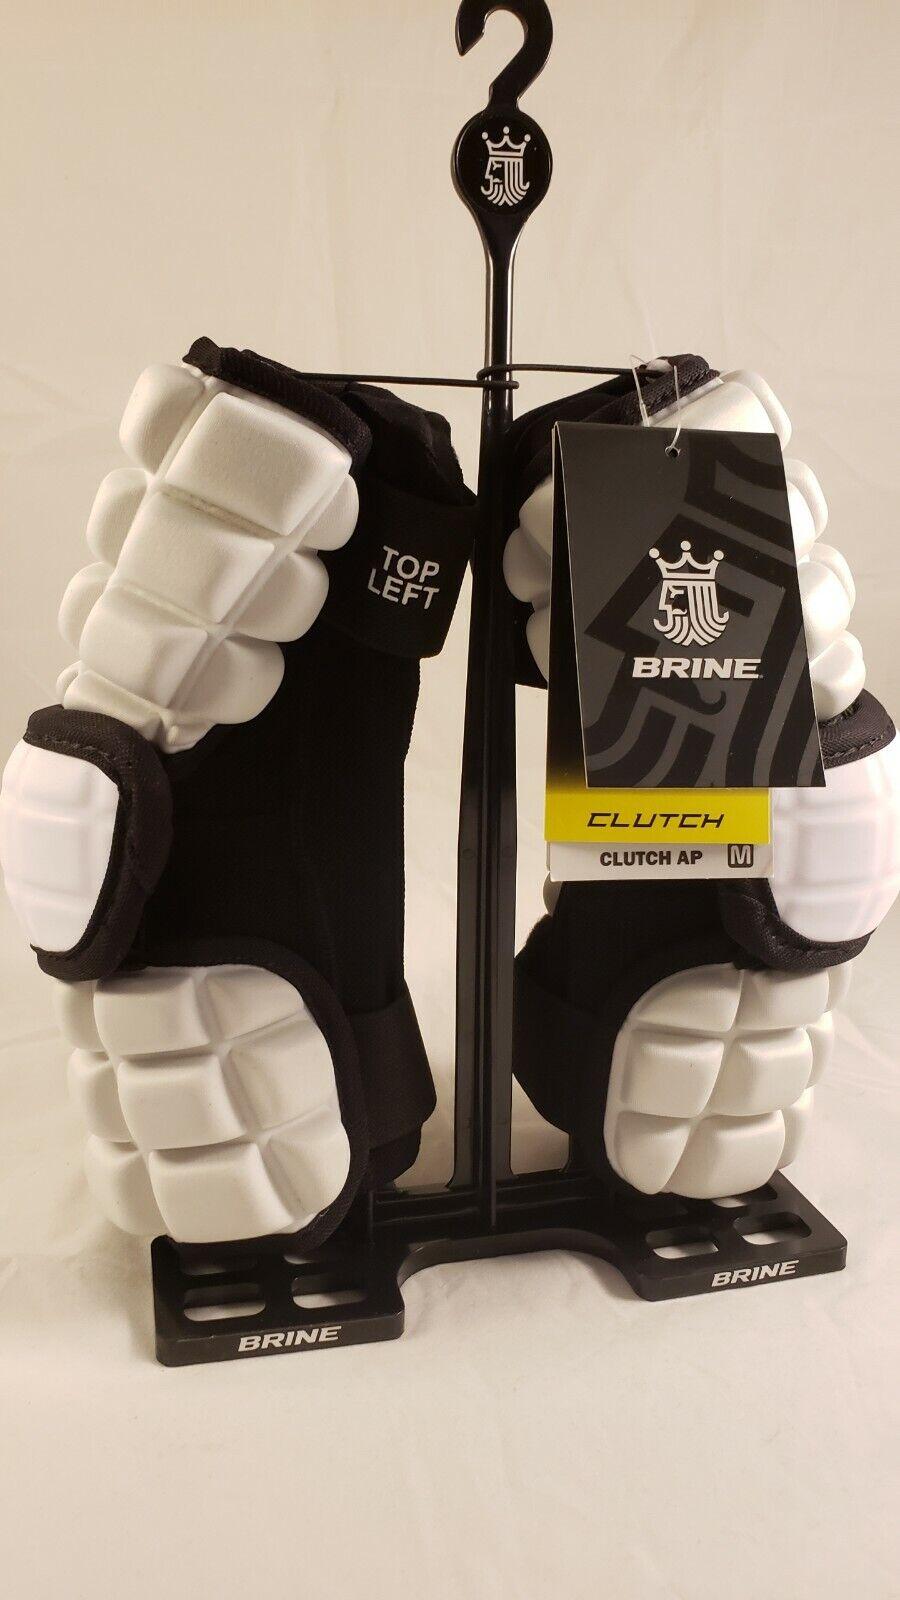 Brine Clutch AP Lacrosse Midfield Arm Pads - Small (White)